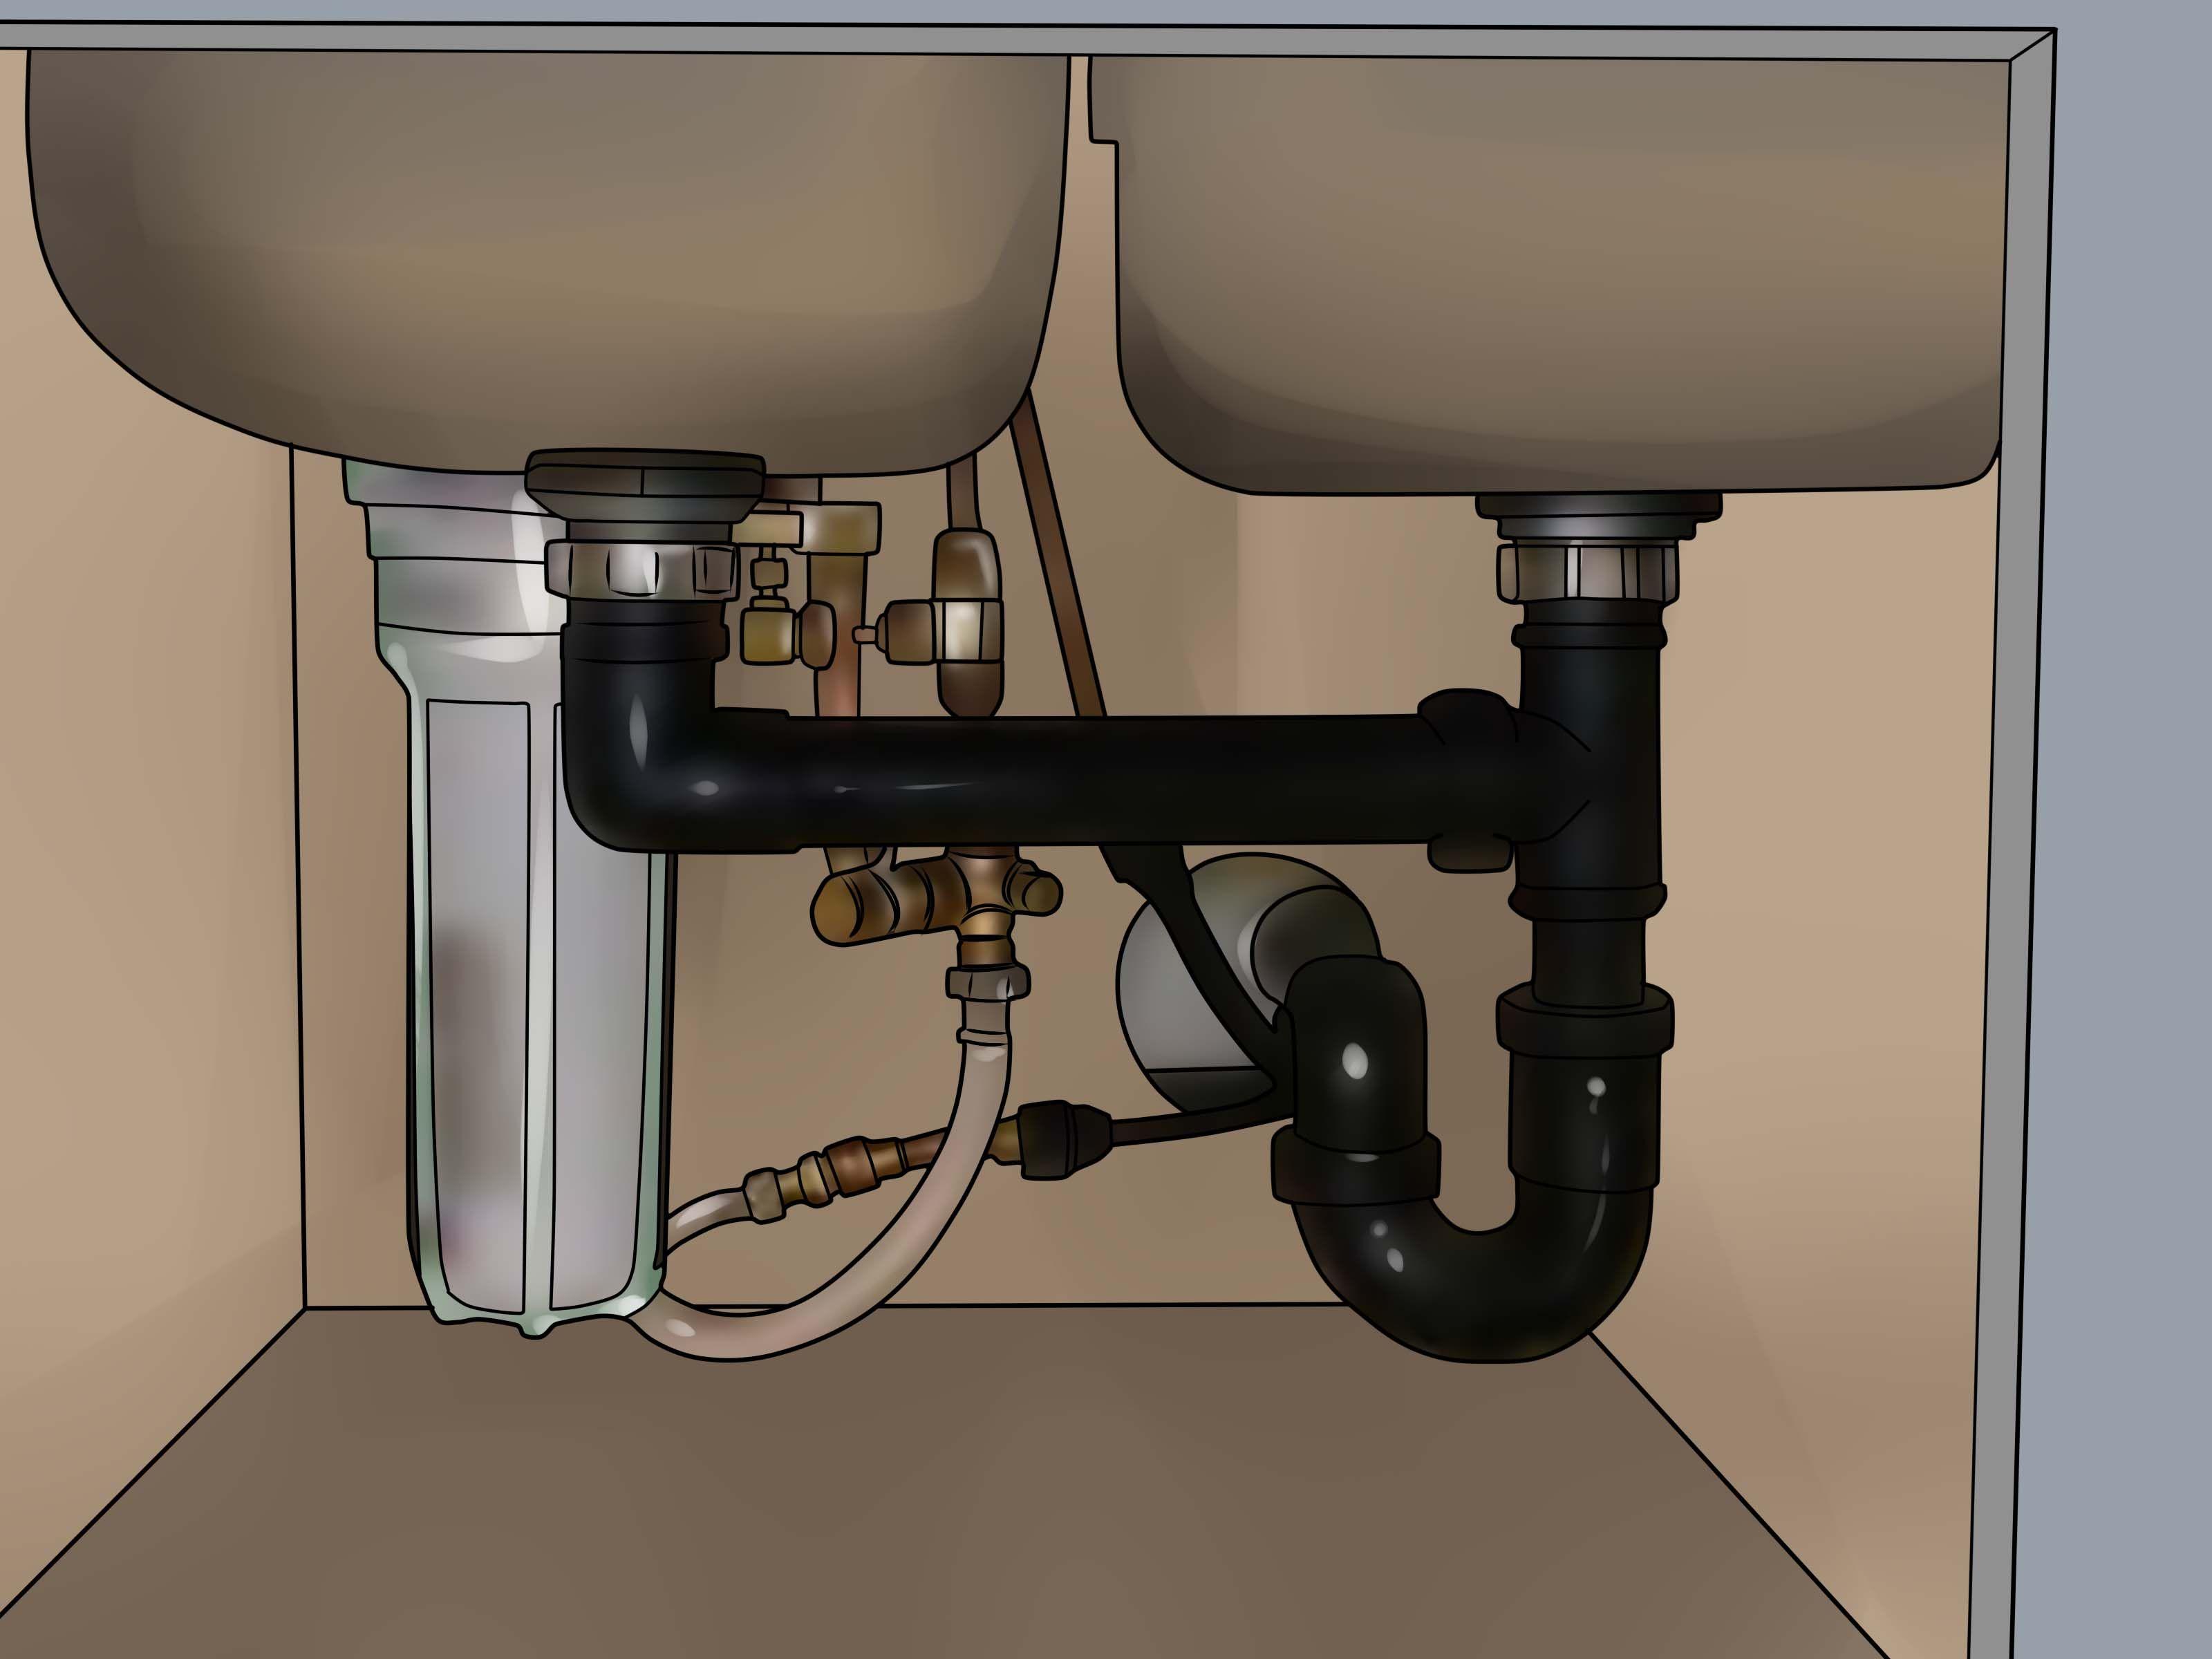 Dechlorinate water beams post and beam drinking water